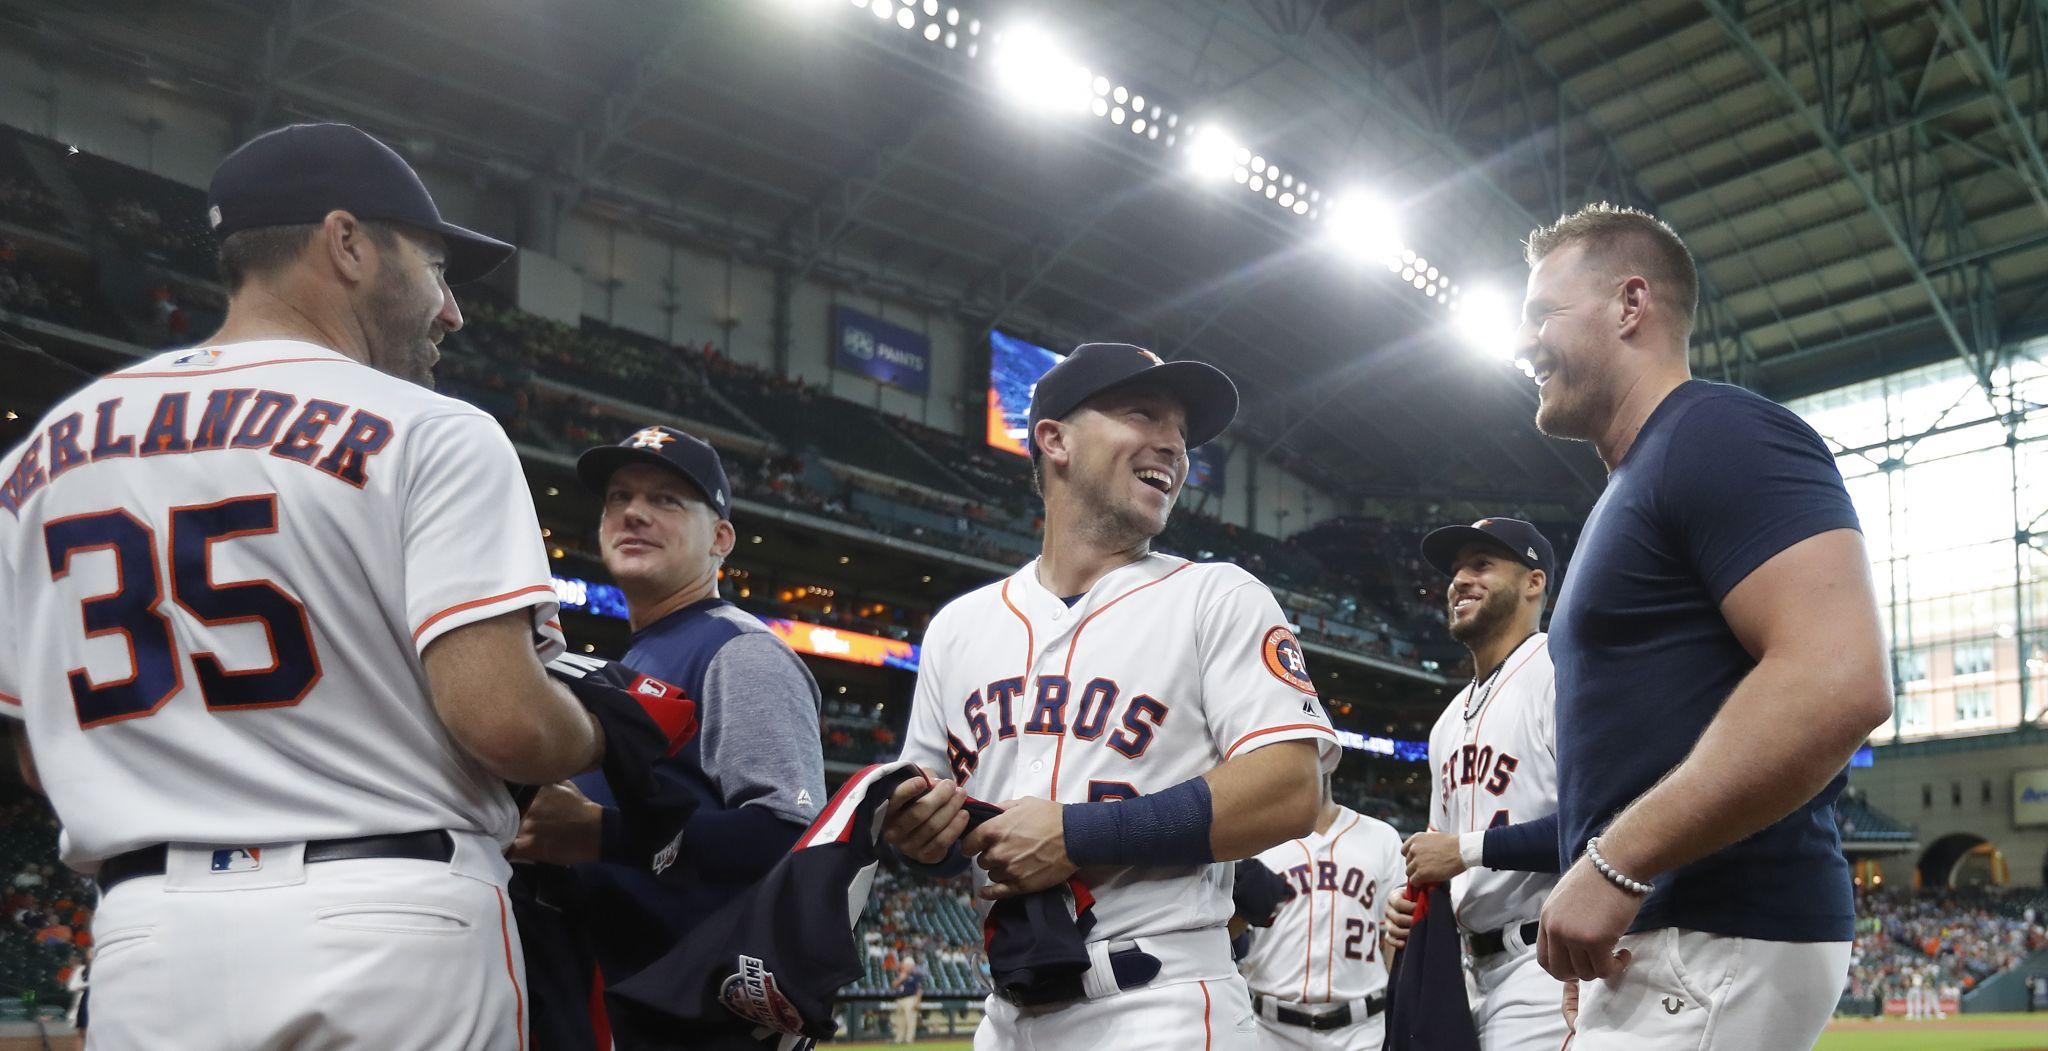 Texans' J.J. Watt bullish on Astros' chances